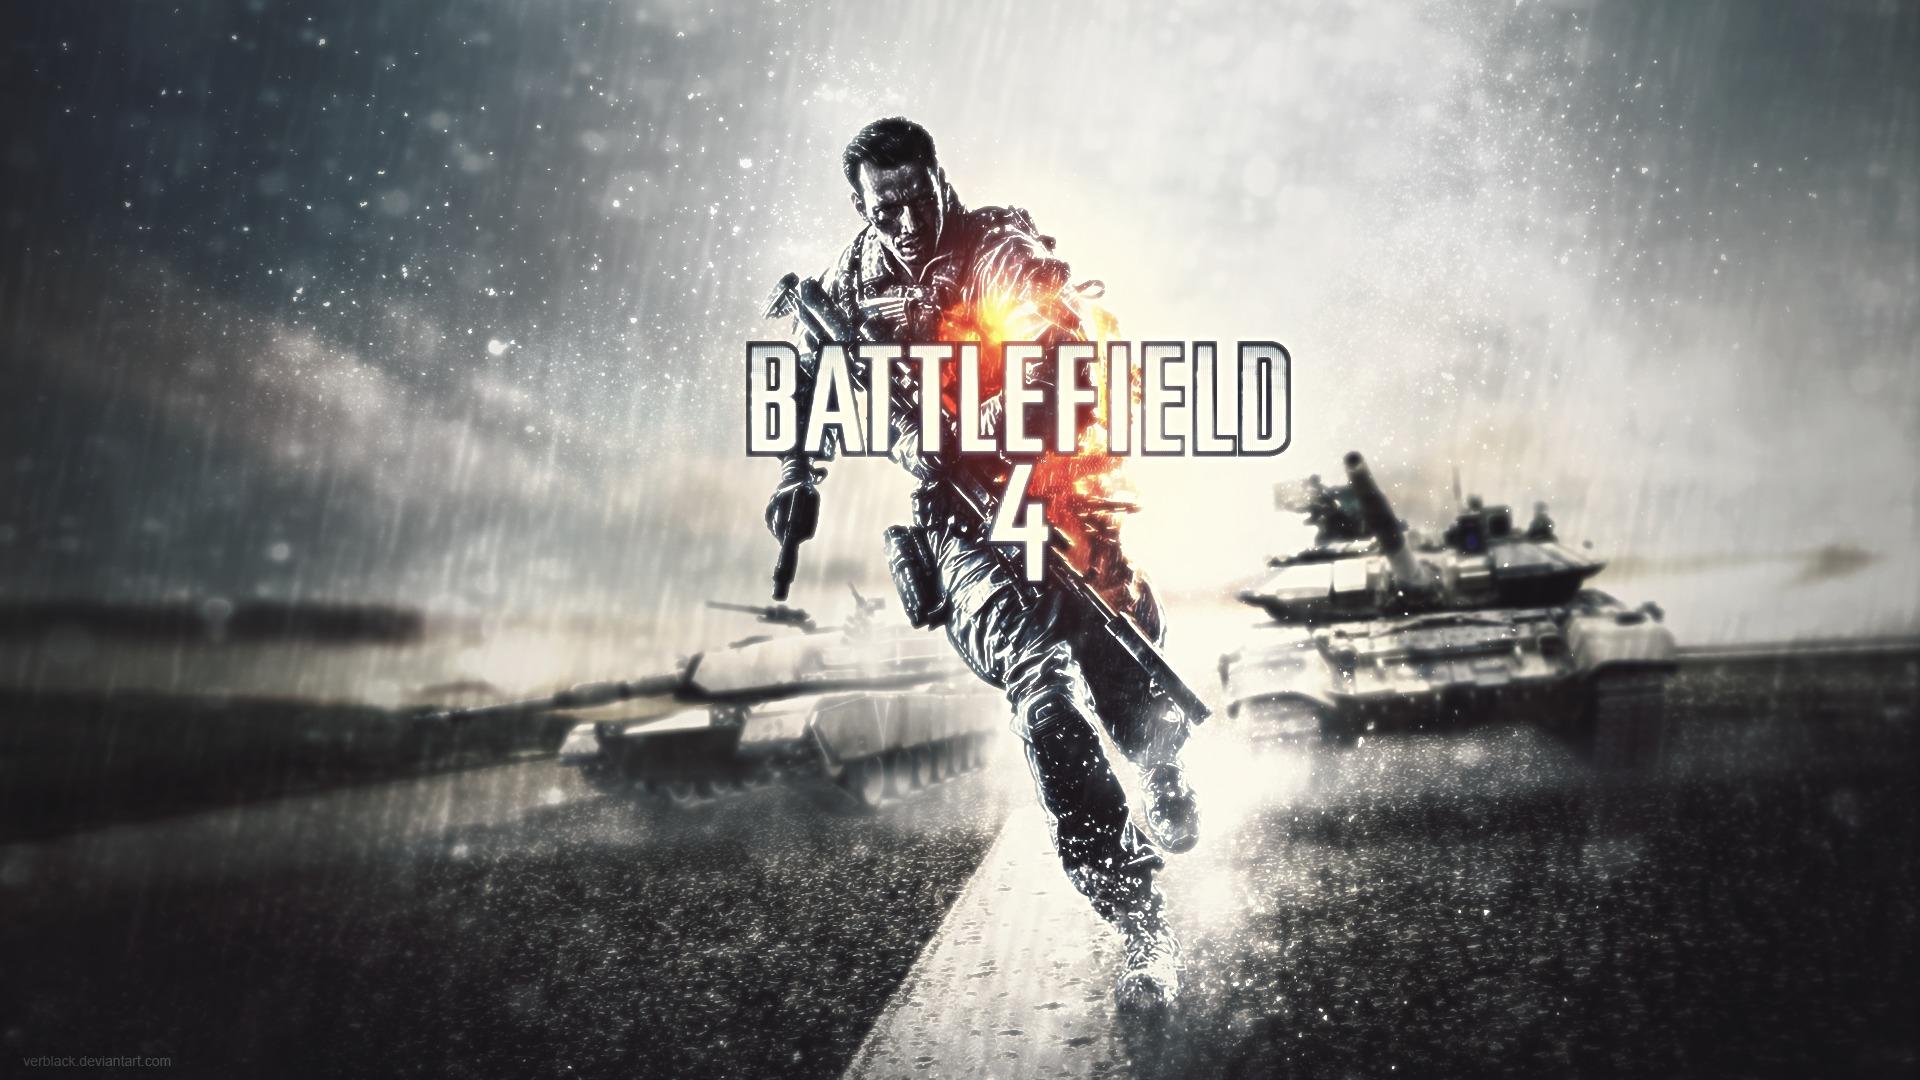 Wallpaper Electronic Arts Battlefield 4 Image